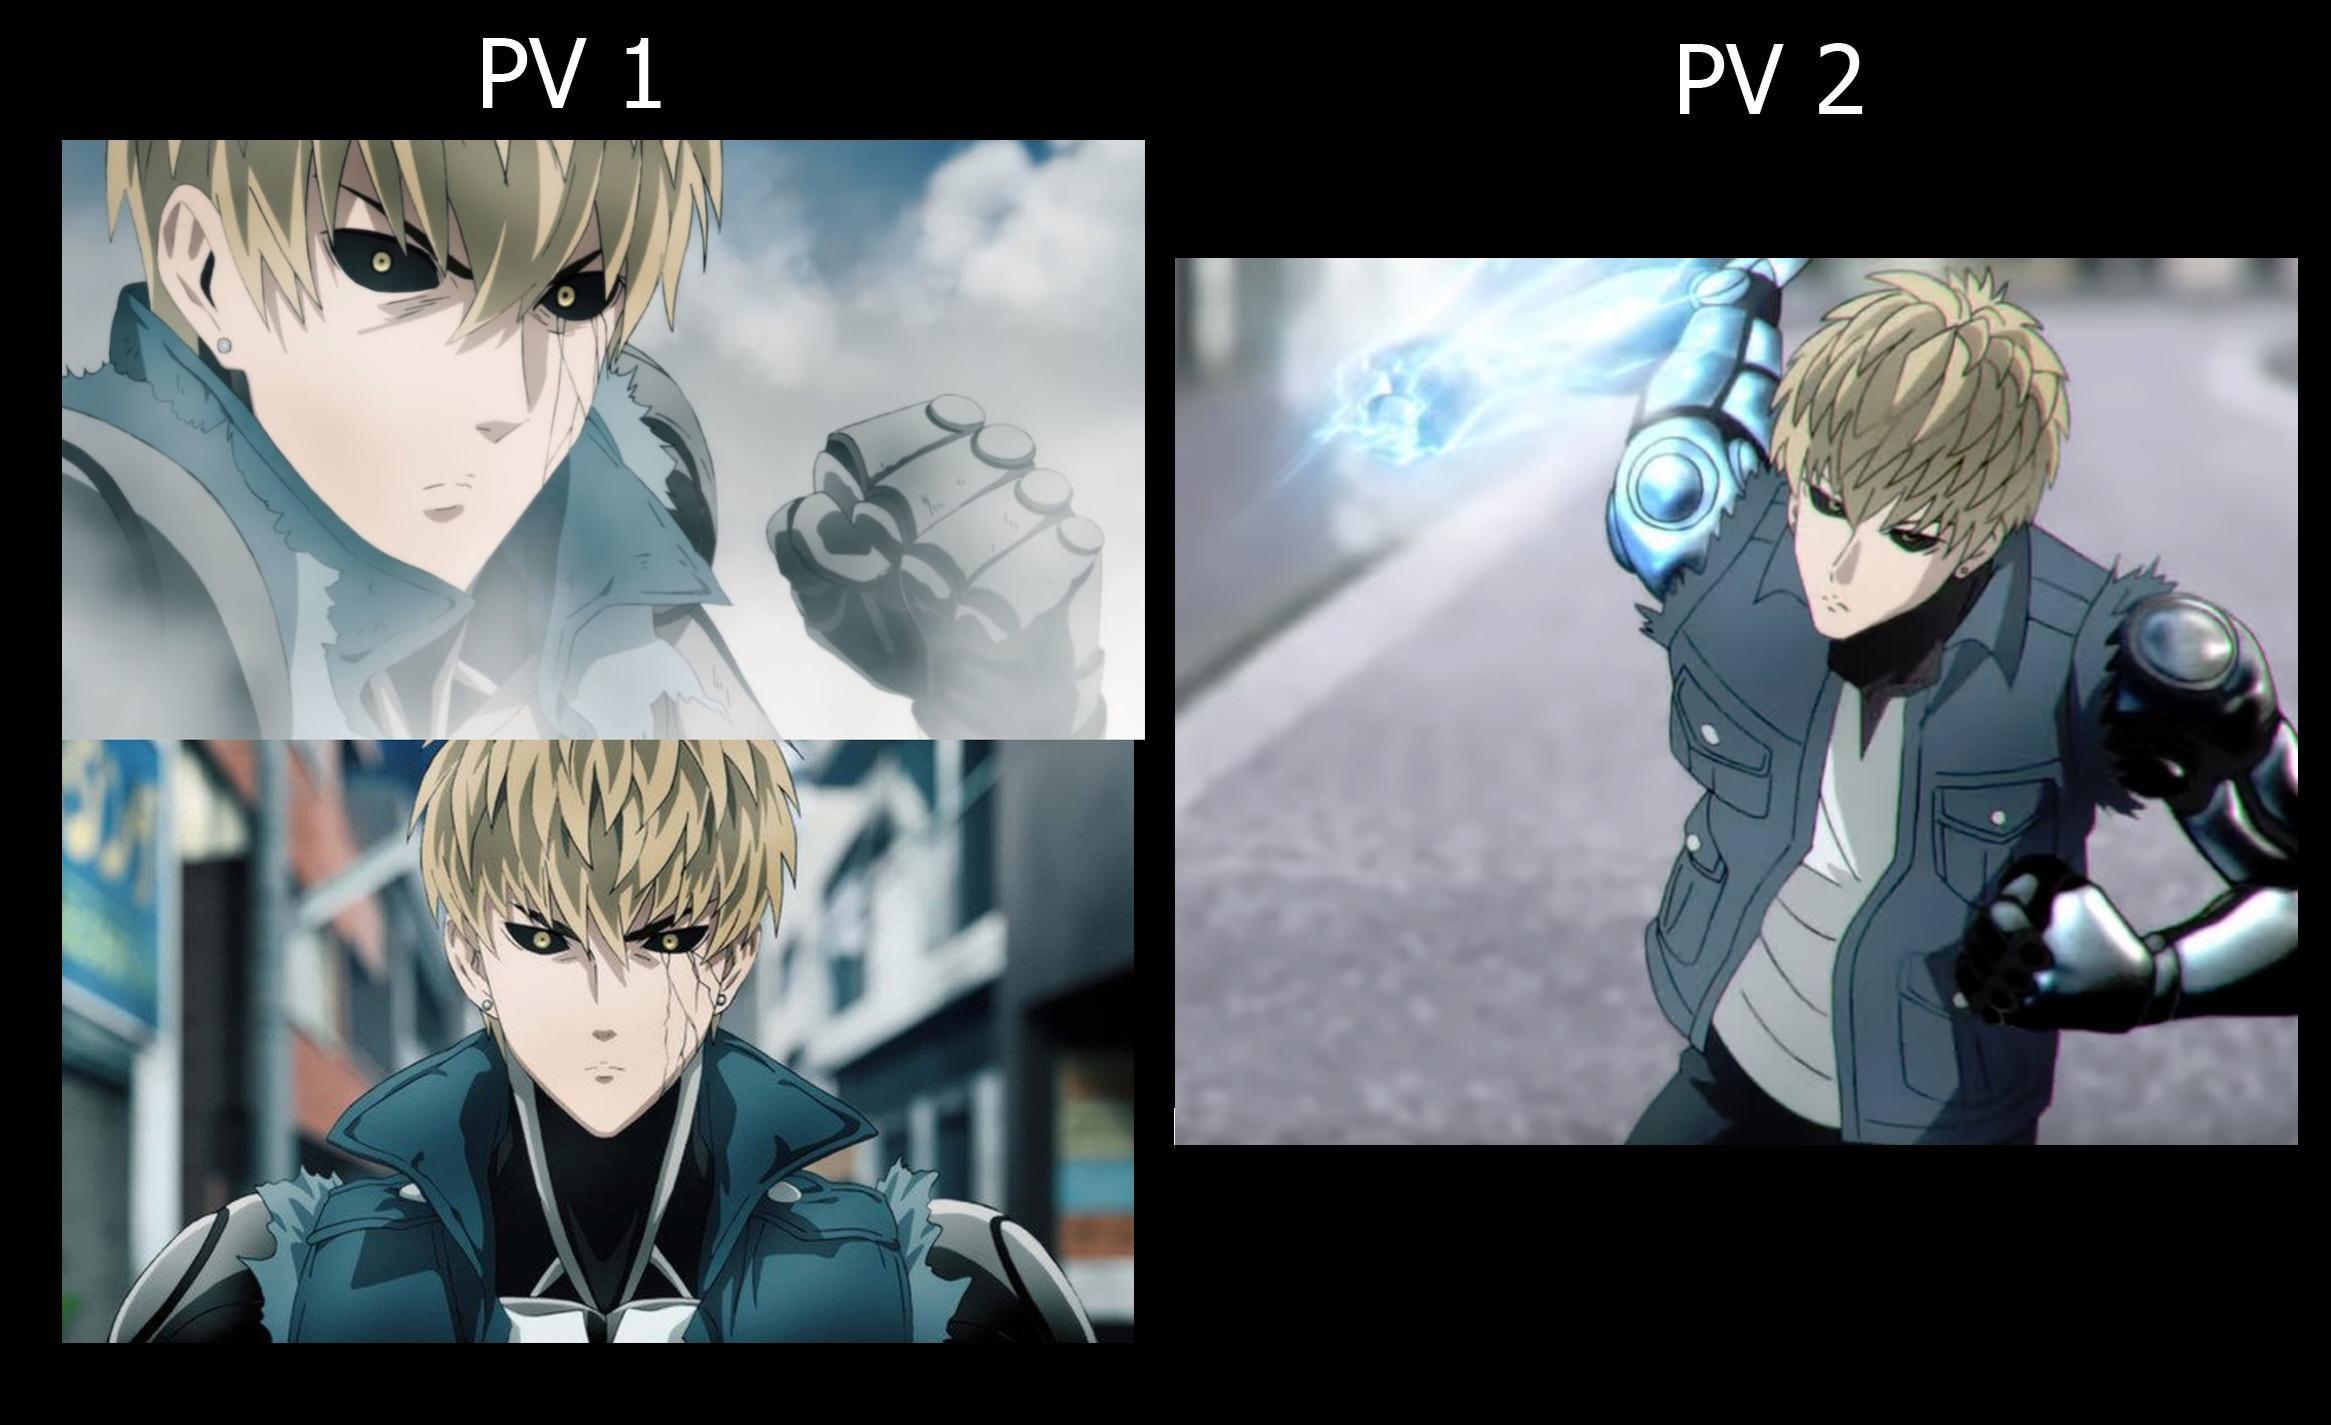 One Punch Man Season 2 Genos Comparison Https Ift Tt 2whhooq One Punch Man Season Tokyo Ghoul Cosplay Tokyo Ghoul Fan Art